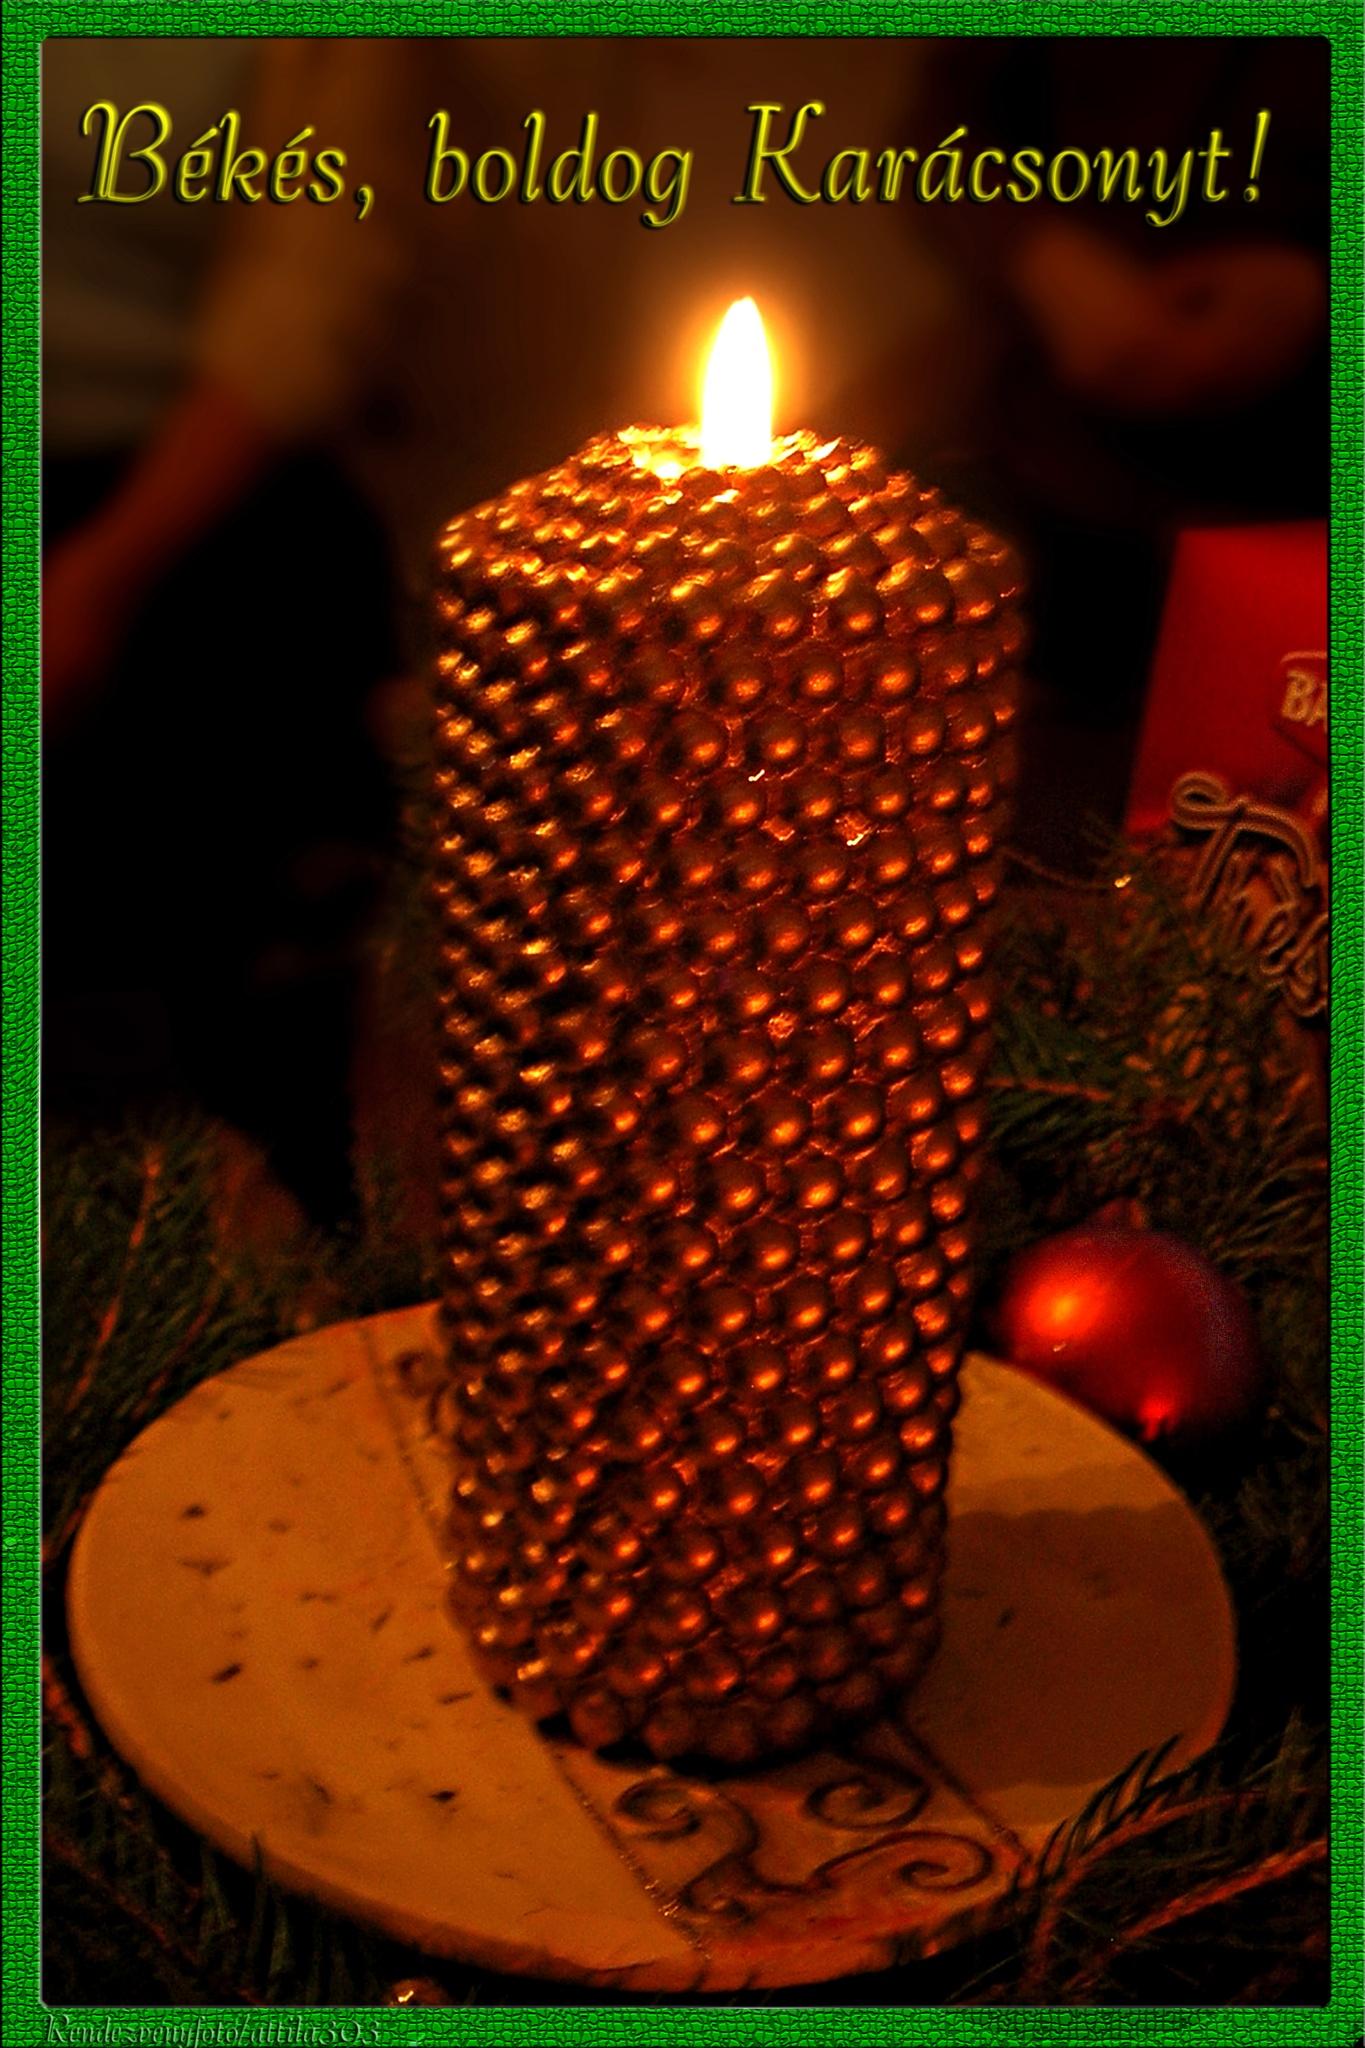 Merry Crismas by Event photo- video